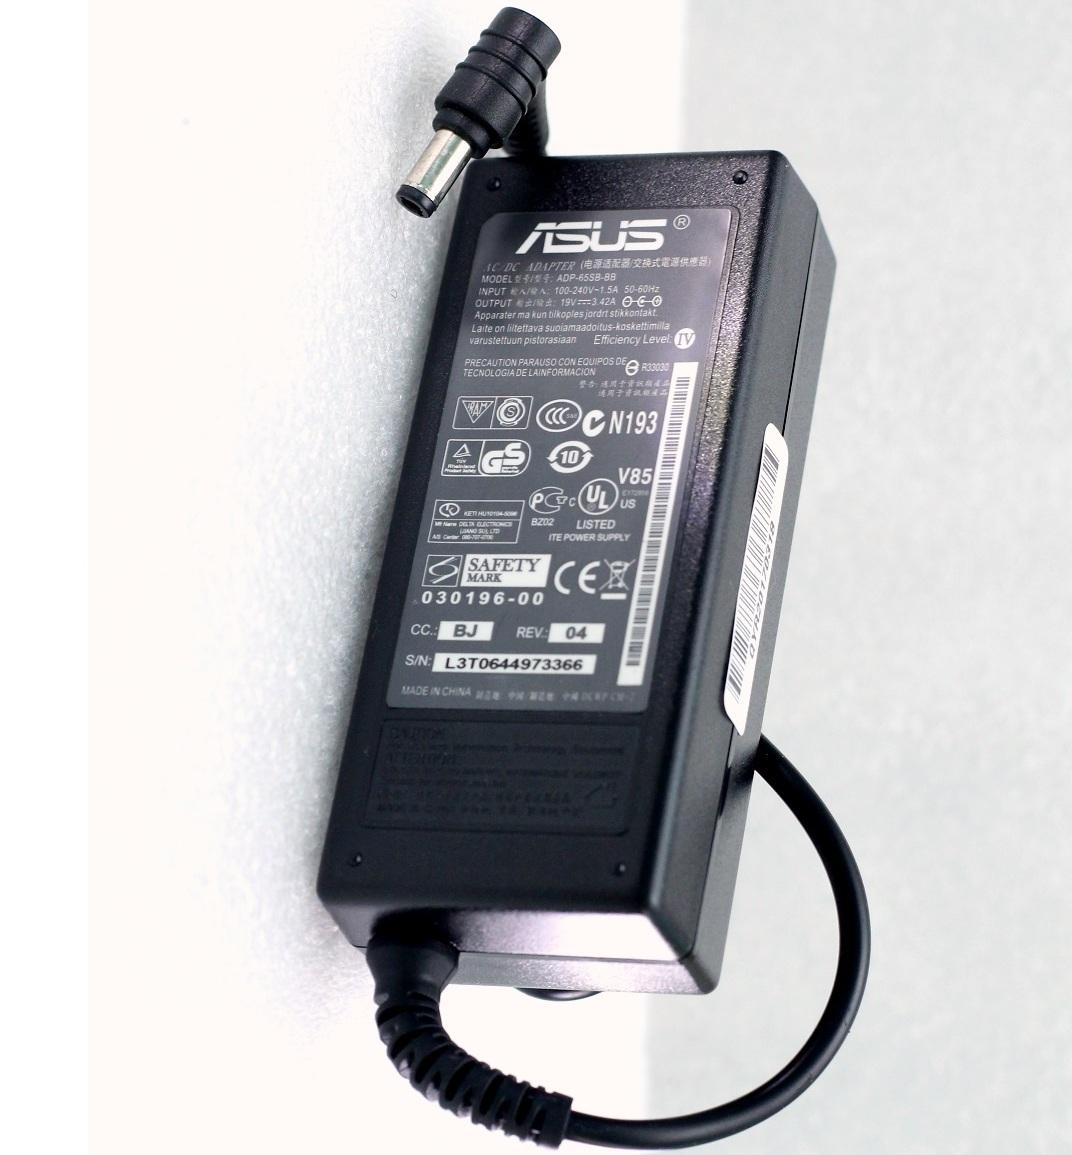 ASUS L2000E VGA DRIVERS WINDOWS 7